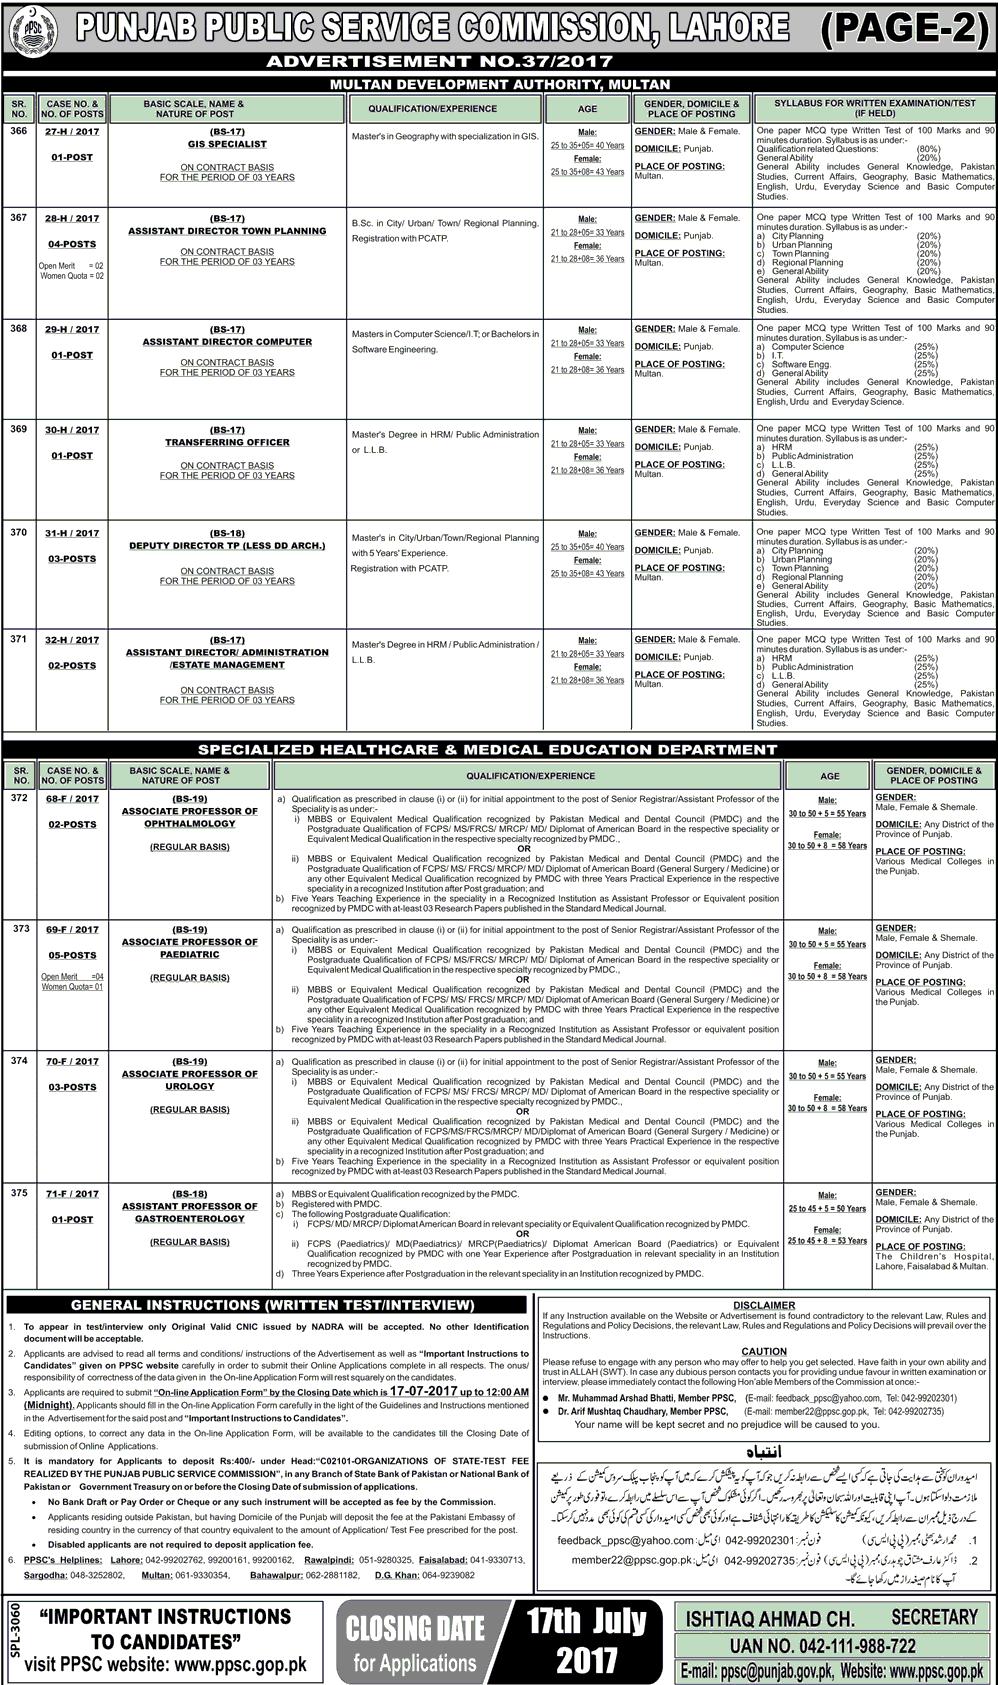 PPSC Multan Development Authority MDA Jobs 2017 Online Registration, Advertisement